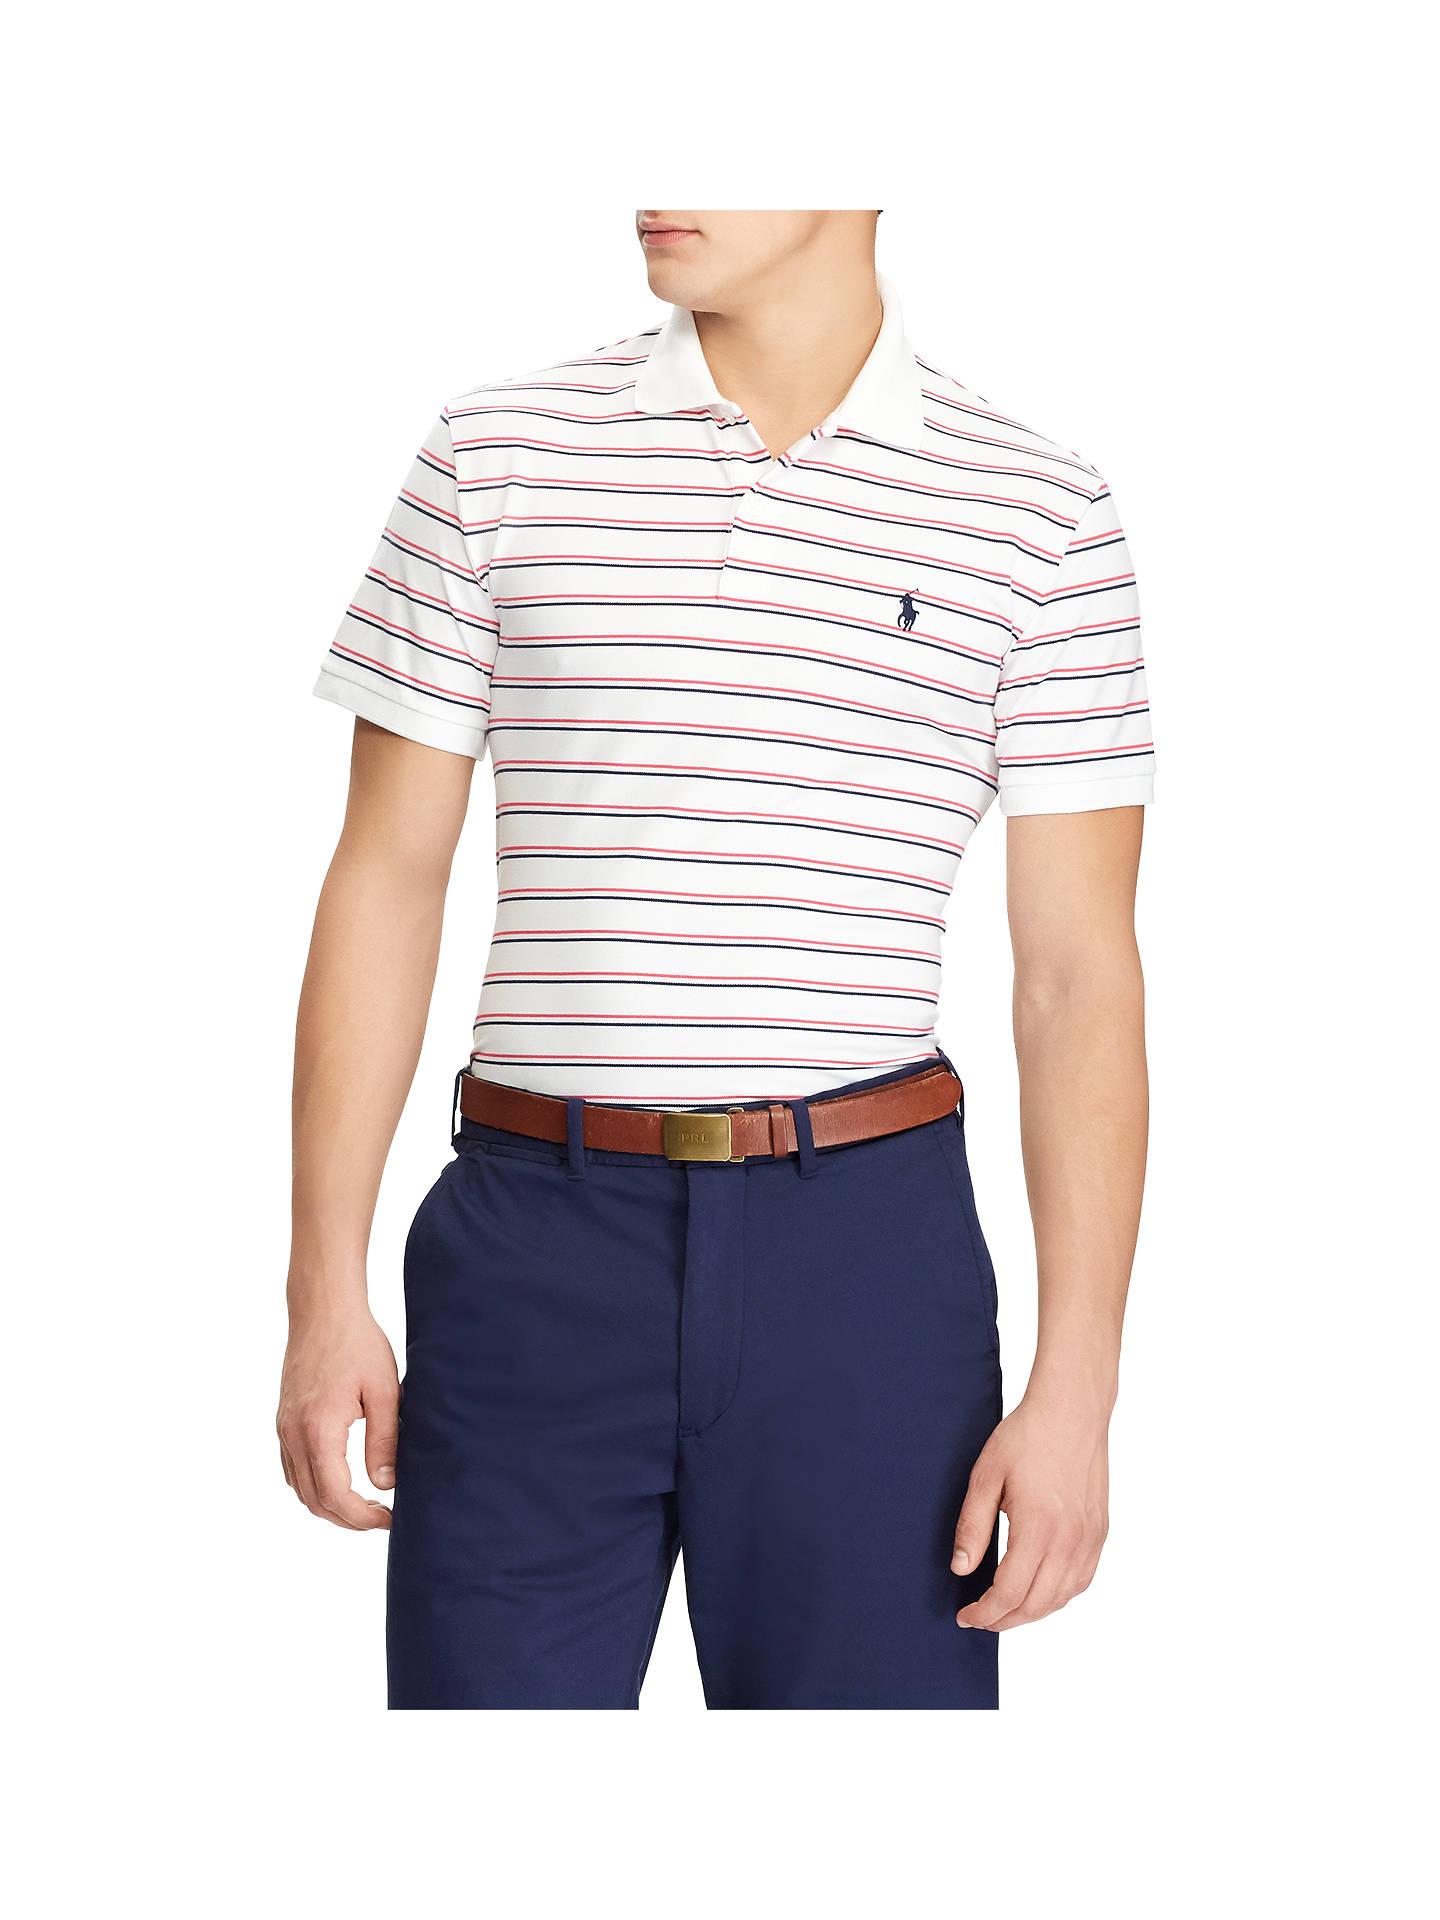 204514919448 Buy Polo Golf by Ralph Lauren Pro-Fit Stripe Polo Shirt